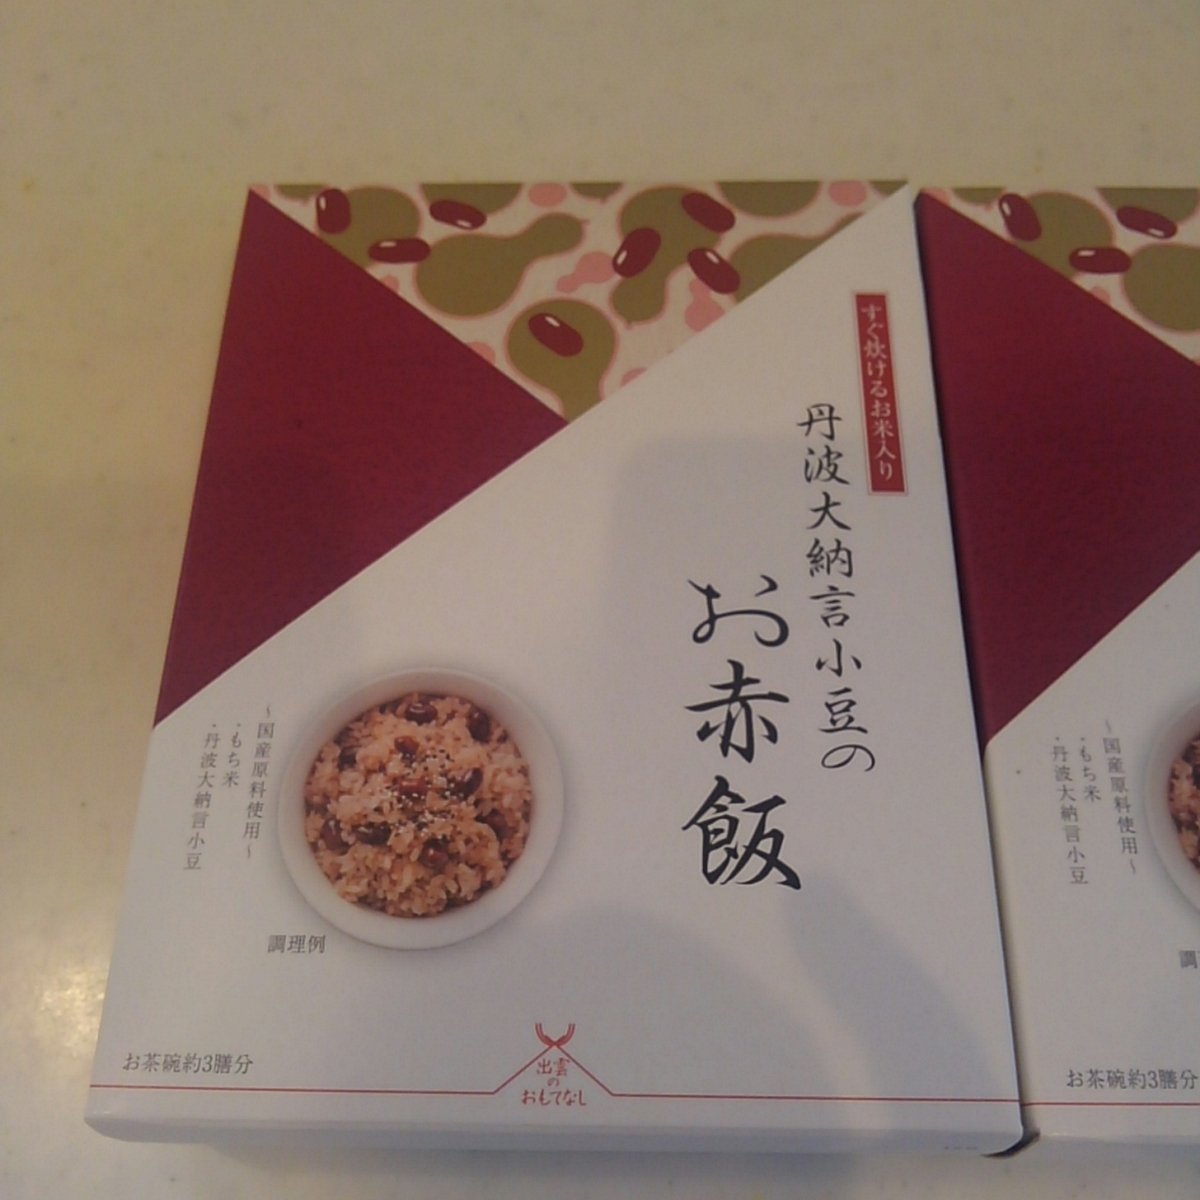 丹波大納言小豆のお赤飯